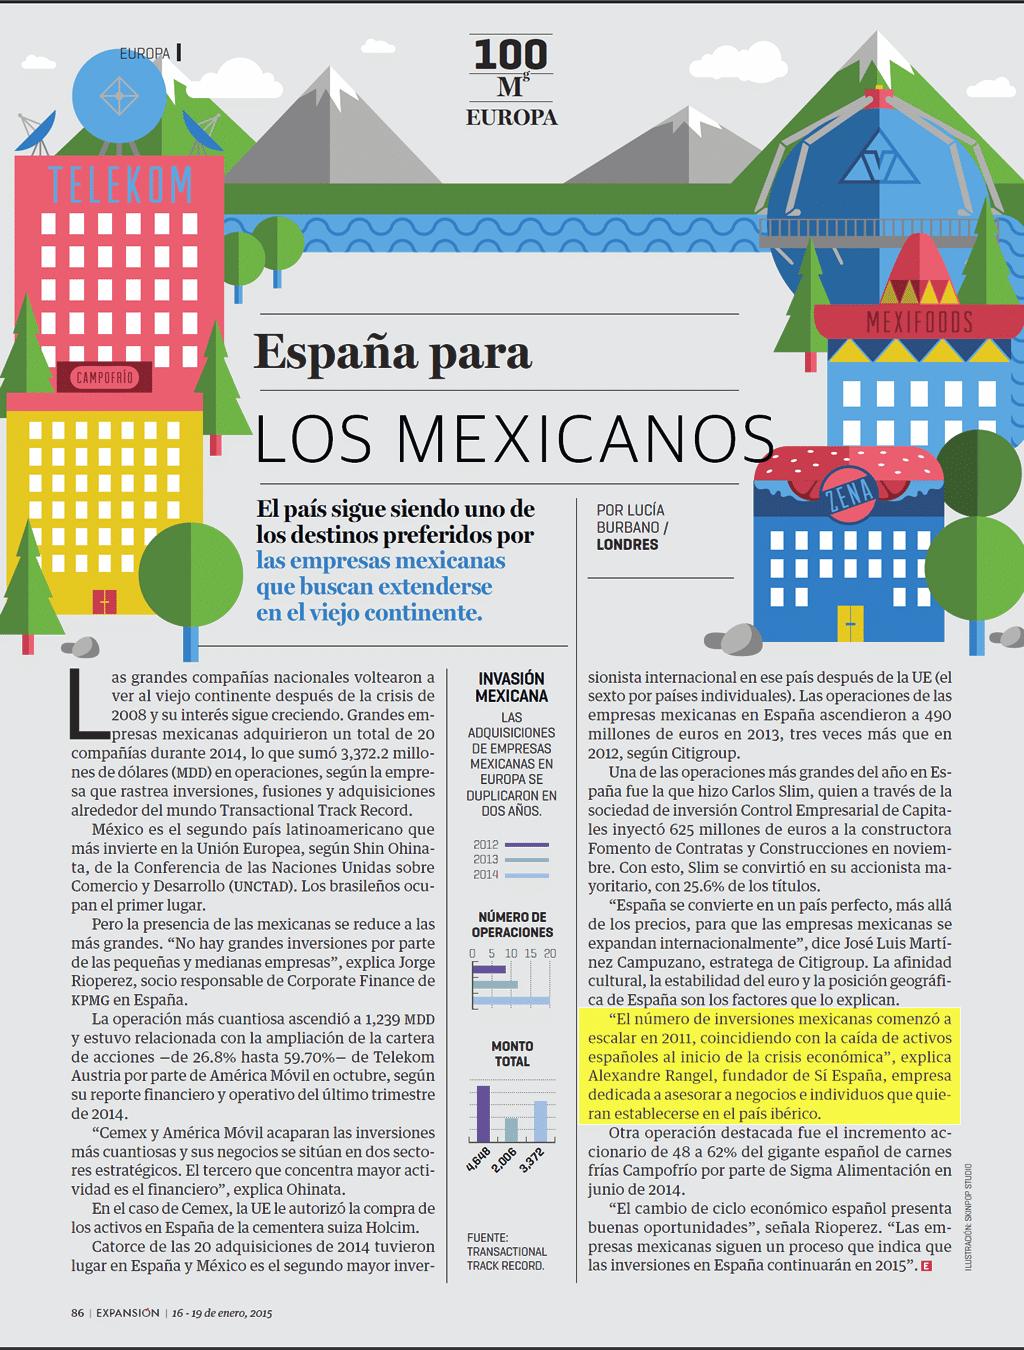 espana-para-los-mexicanos-magazine-article-siespana-alex-rangel-w1024